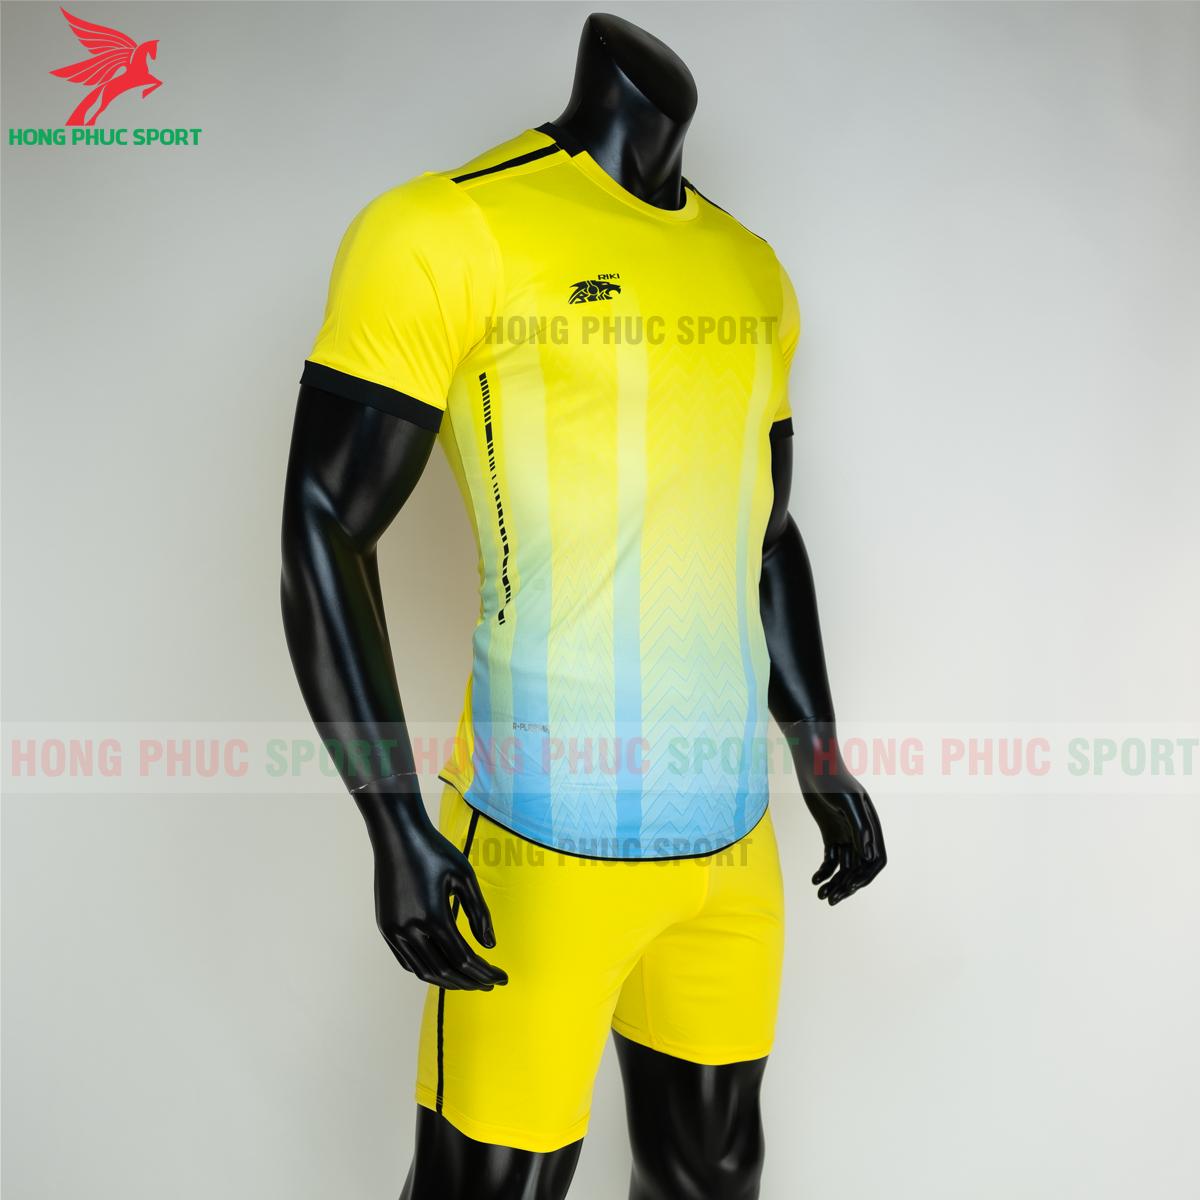 https://cdn.hongphucsport.com/unsafe/s4.shopbay.vn/files/285/ao-bong-da-khong-logo-riki-furior-mau-vang-6-60501627d3c65.png